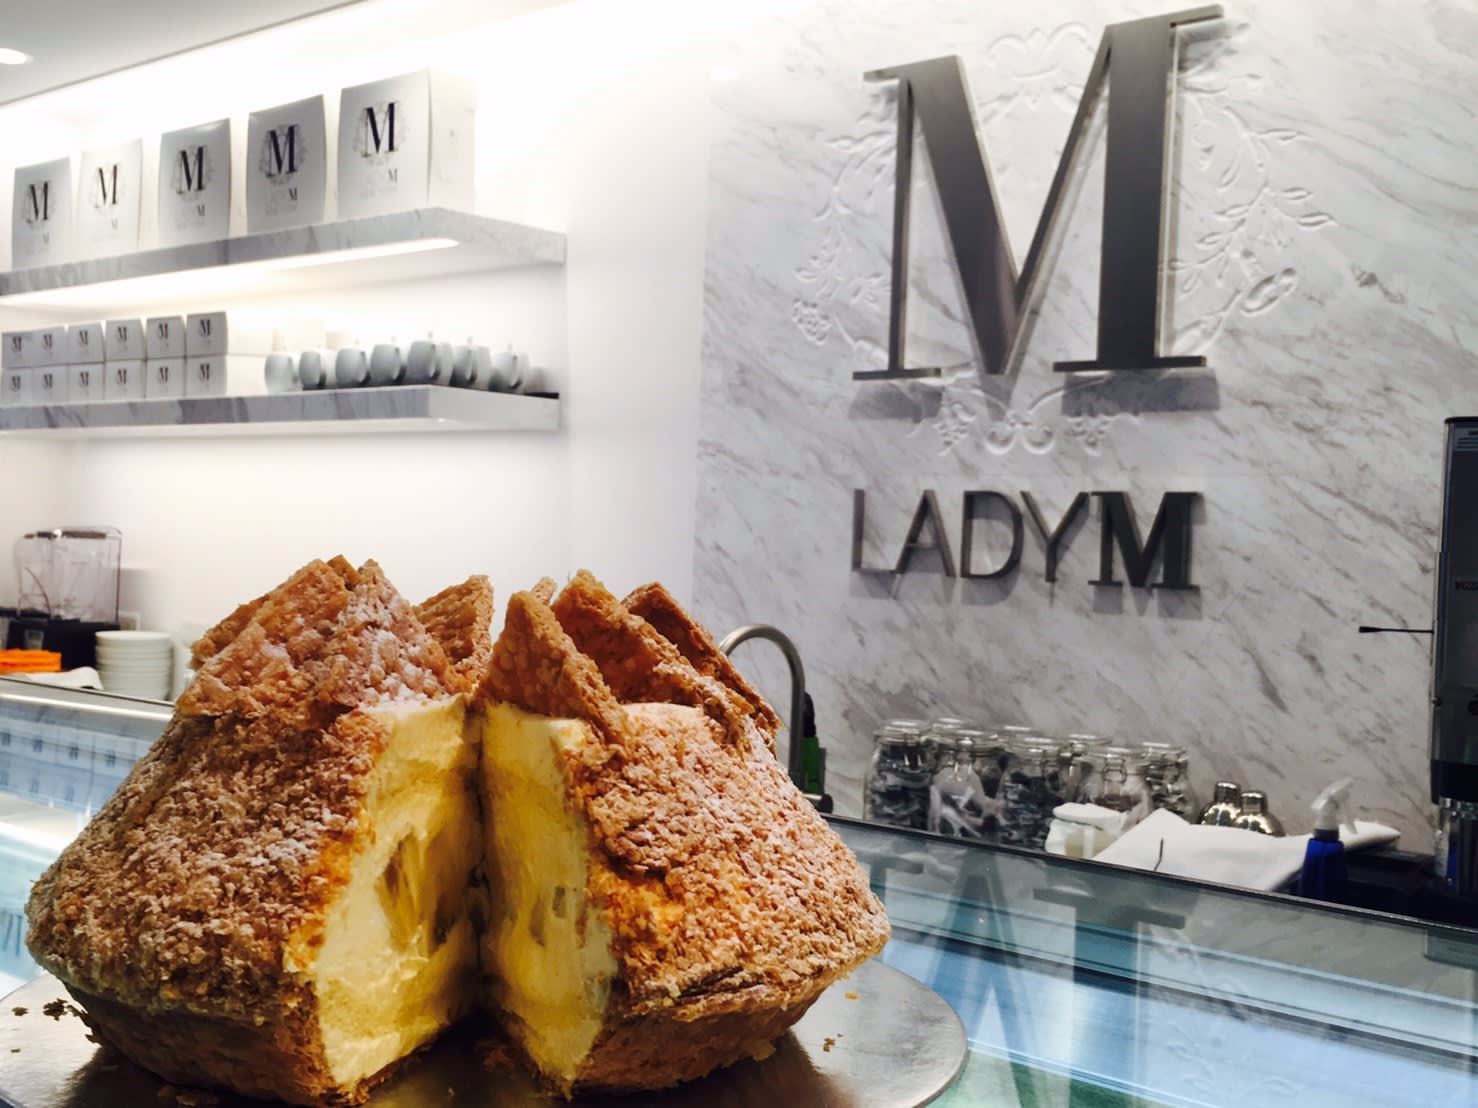 Lady M台灣旗艦店 2月27日盛大開幕。